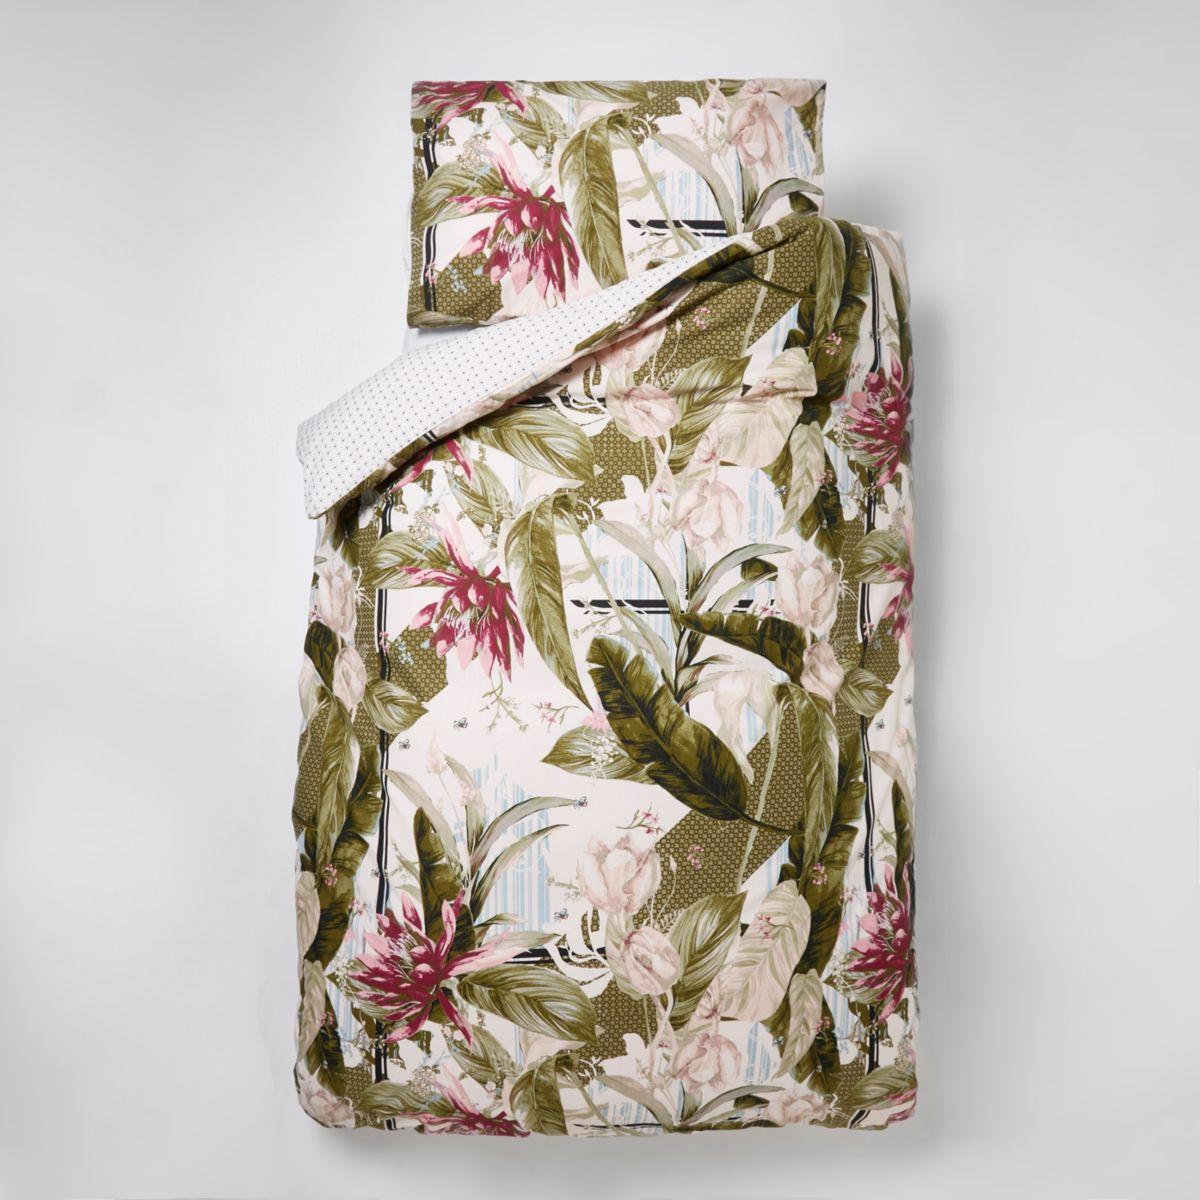 rosa bettw sche set mit palmenprint single accessoires. Black Bedroom Furniture Sets. Home Design Ideas